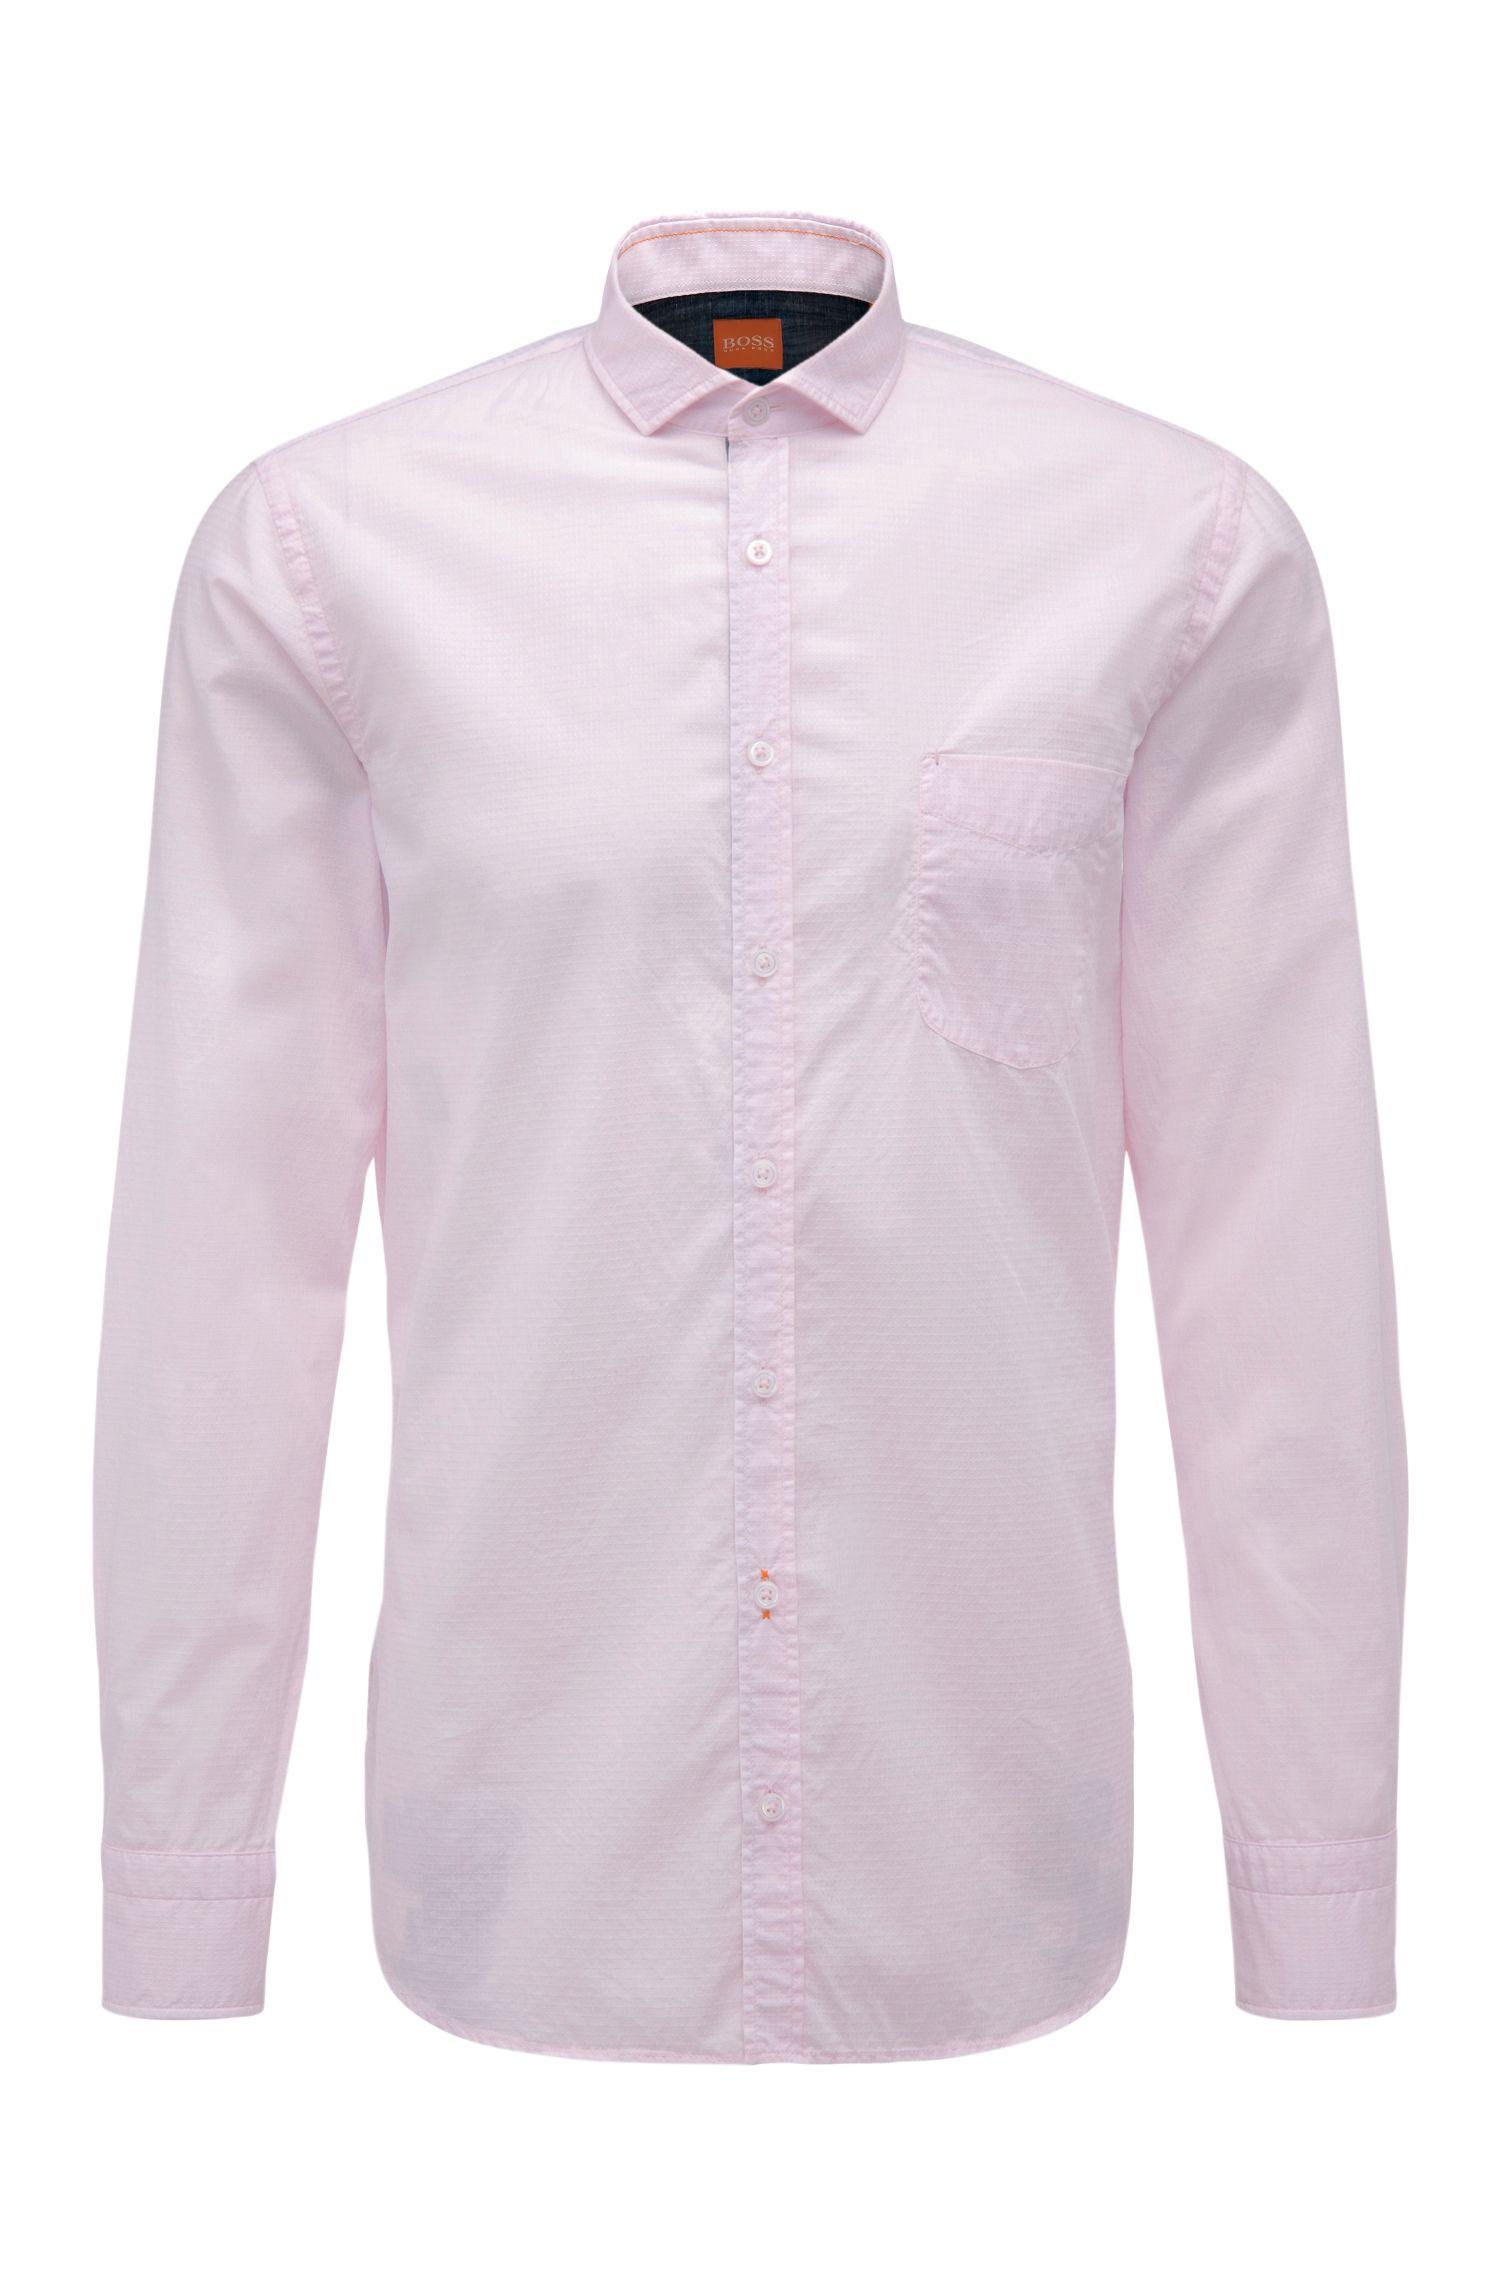 'Cattitude' | Slim Fit, Cotton Button Down Shirt